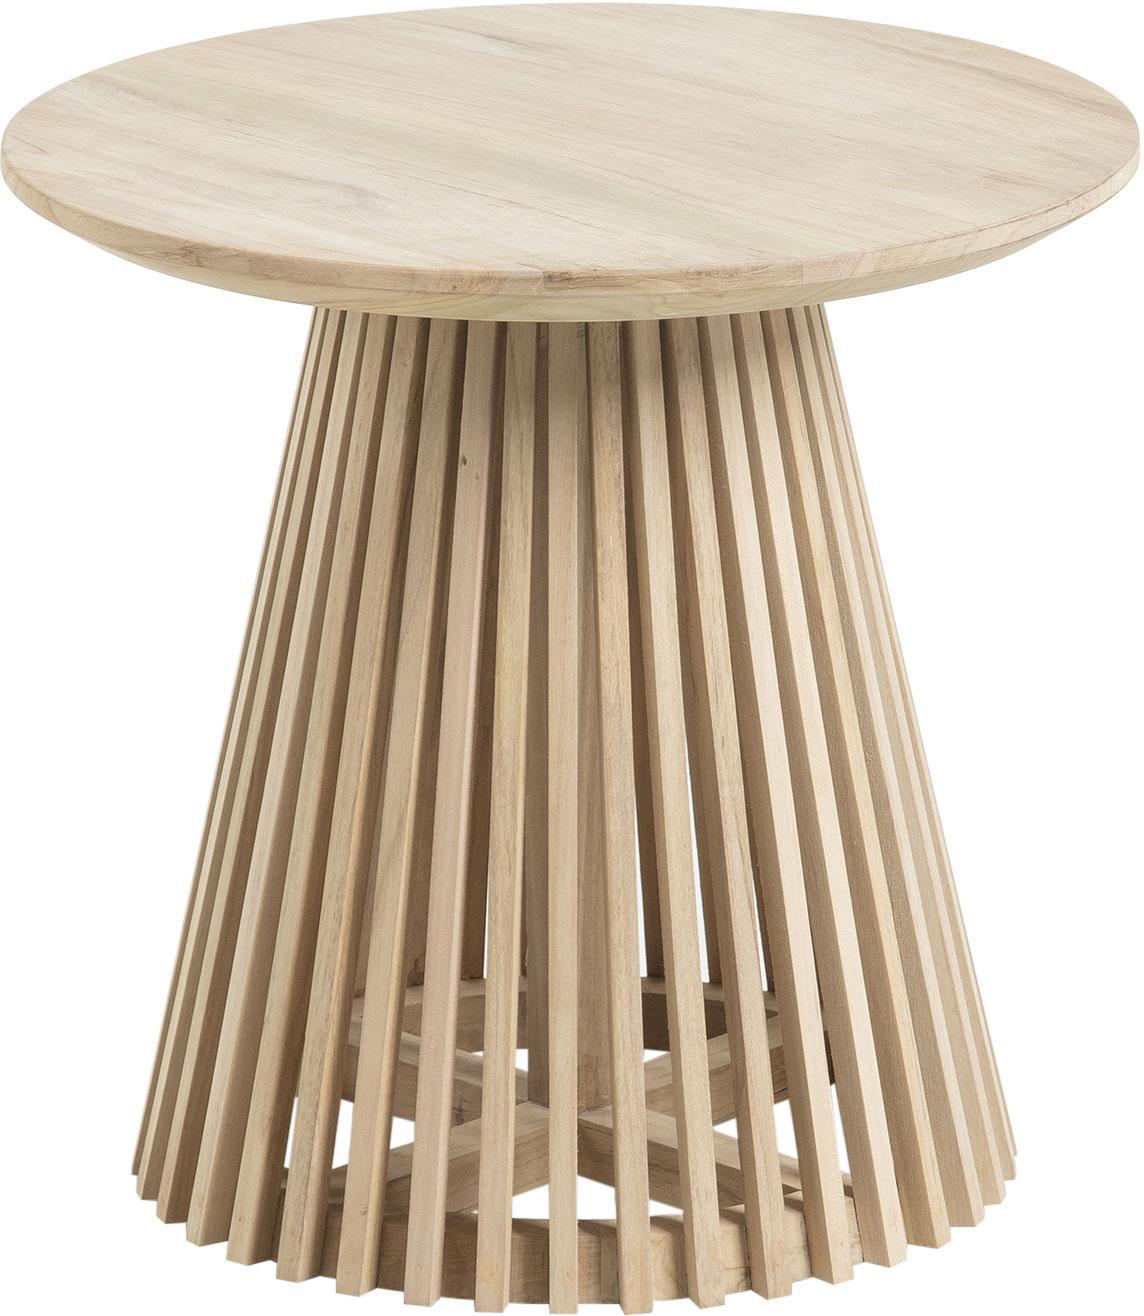 Ronde bijzettafel Jeanette van hout, Teakhout, Teakhoutkleurig, Ø 50 x H 48 cm